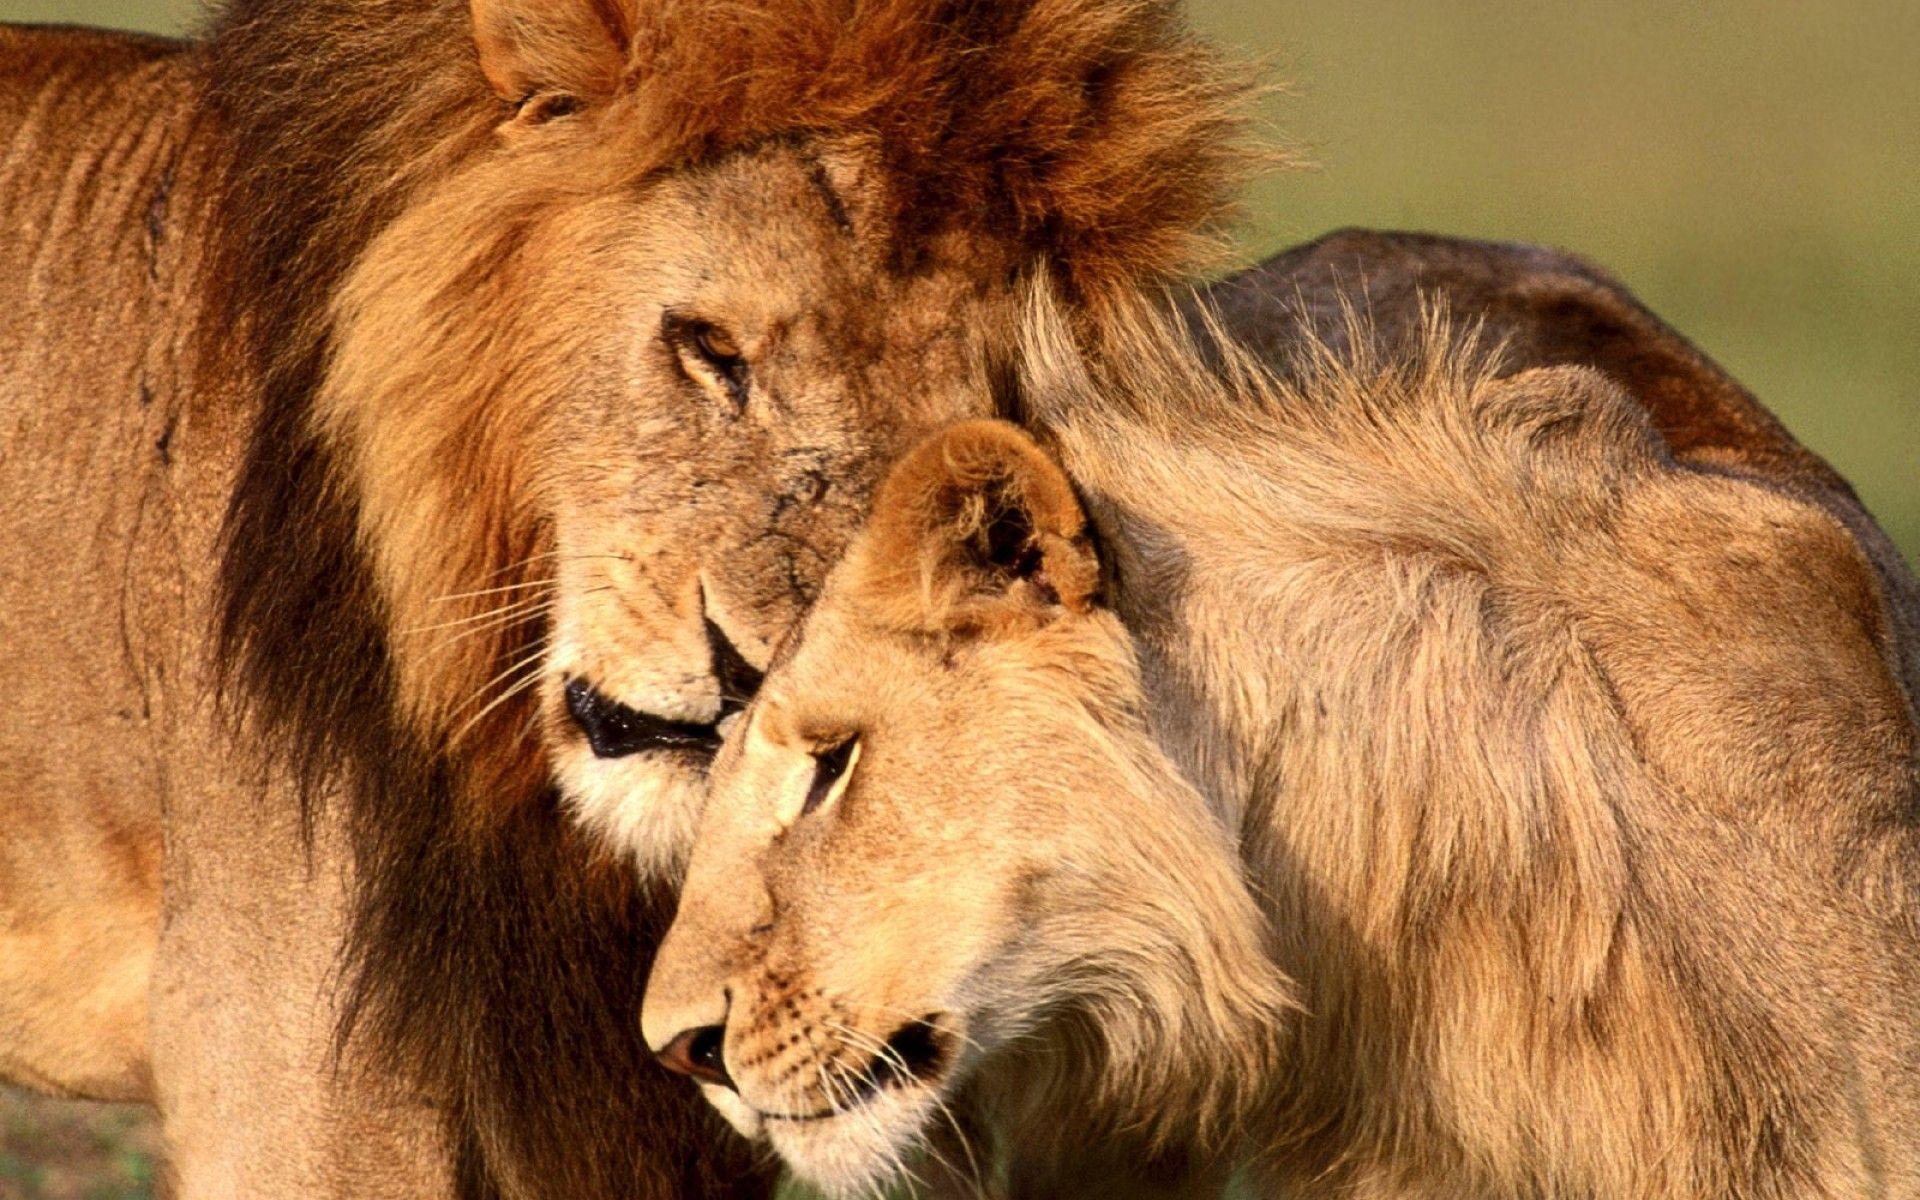 Hd wallpaper lion - Wallpaper 1920x1080 Lion Cat Couple Mane Rest Full Hd